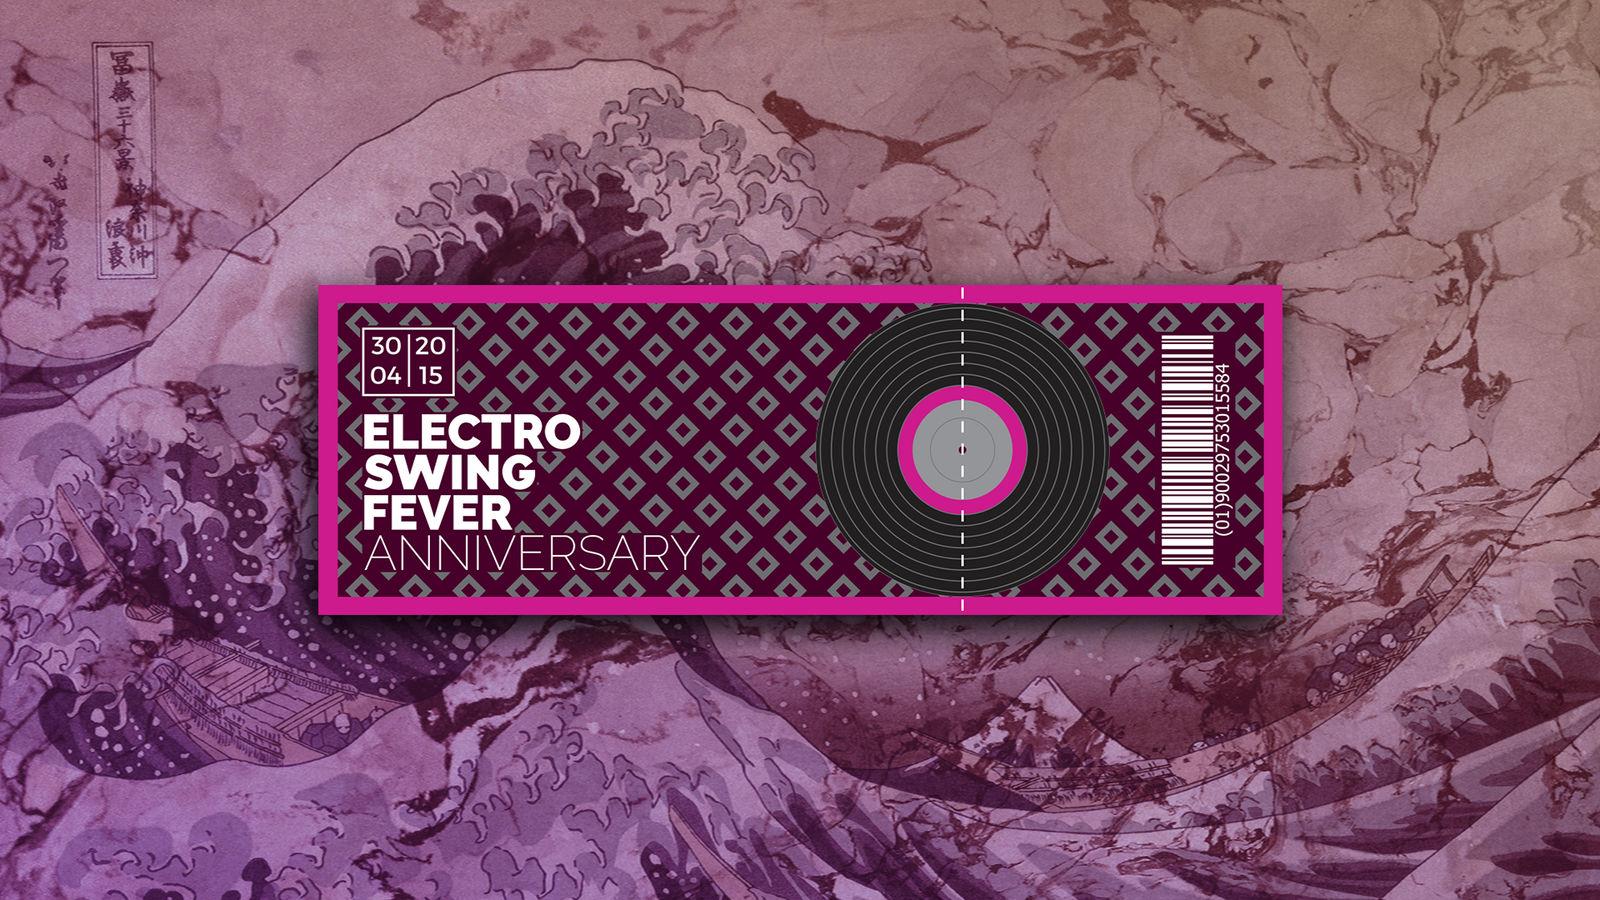 Electro Swing Fever Ticket By Kevinwscherrer On Deviantart